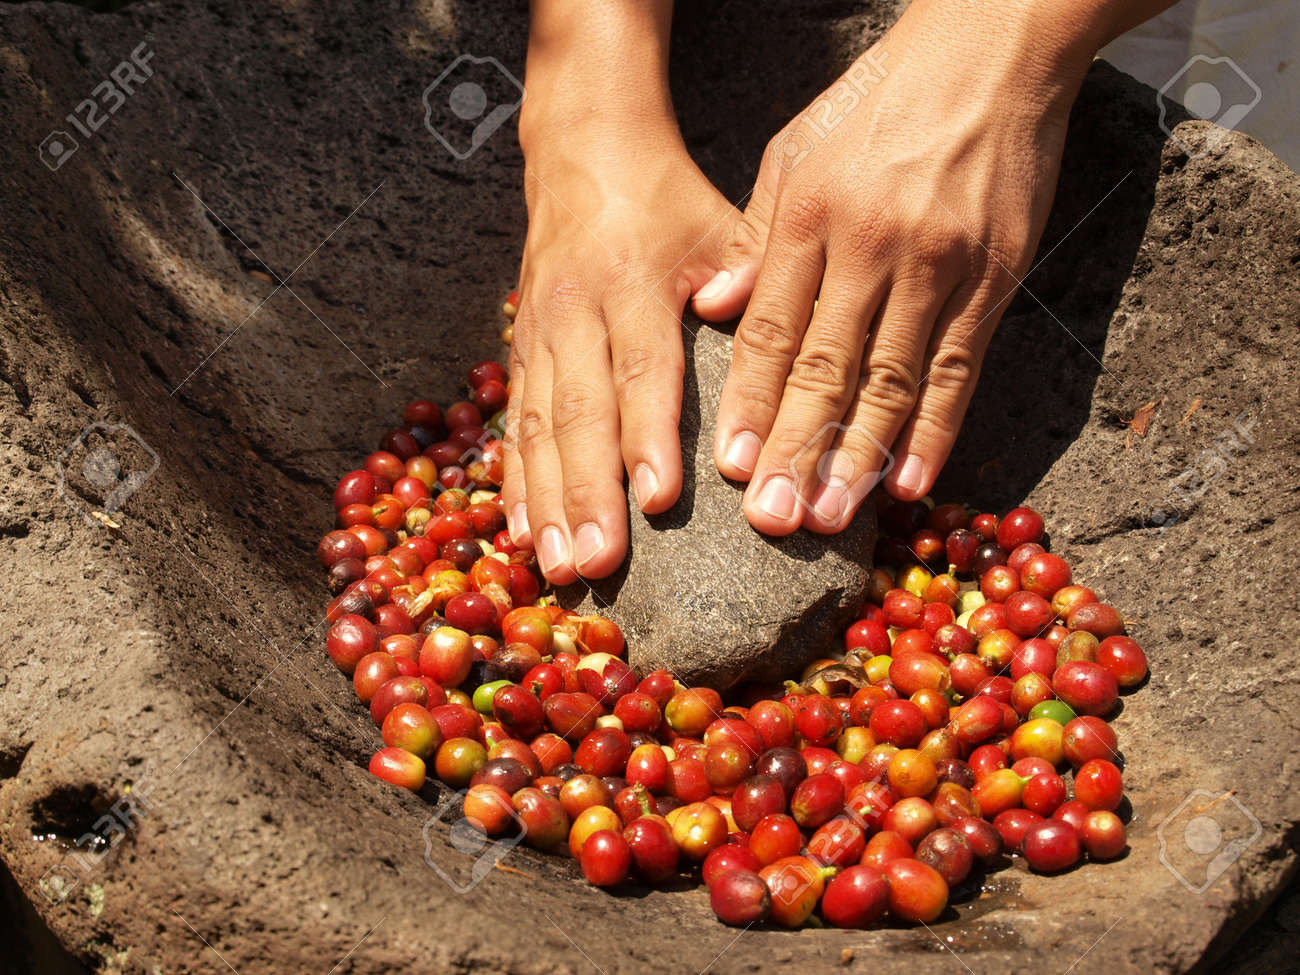 Grinding coffee berries in hand mortar Stock Photo - 12717921